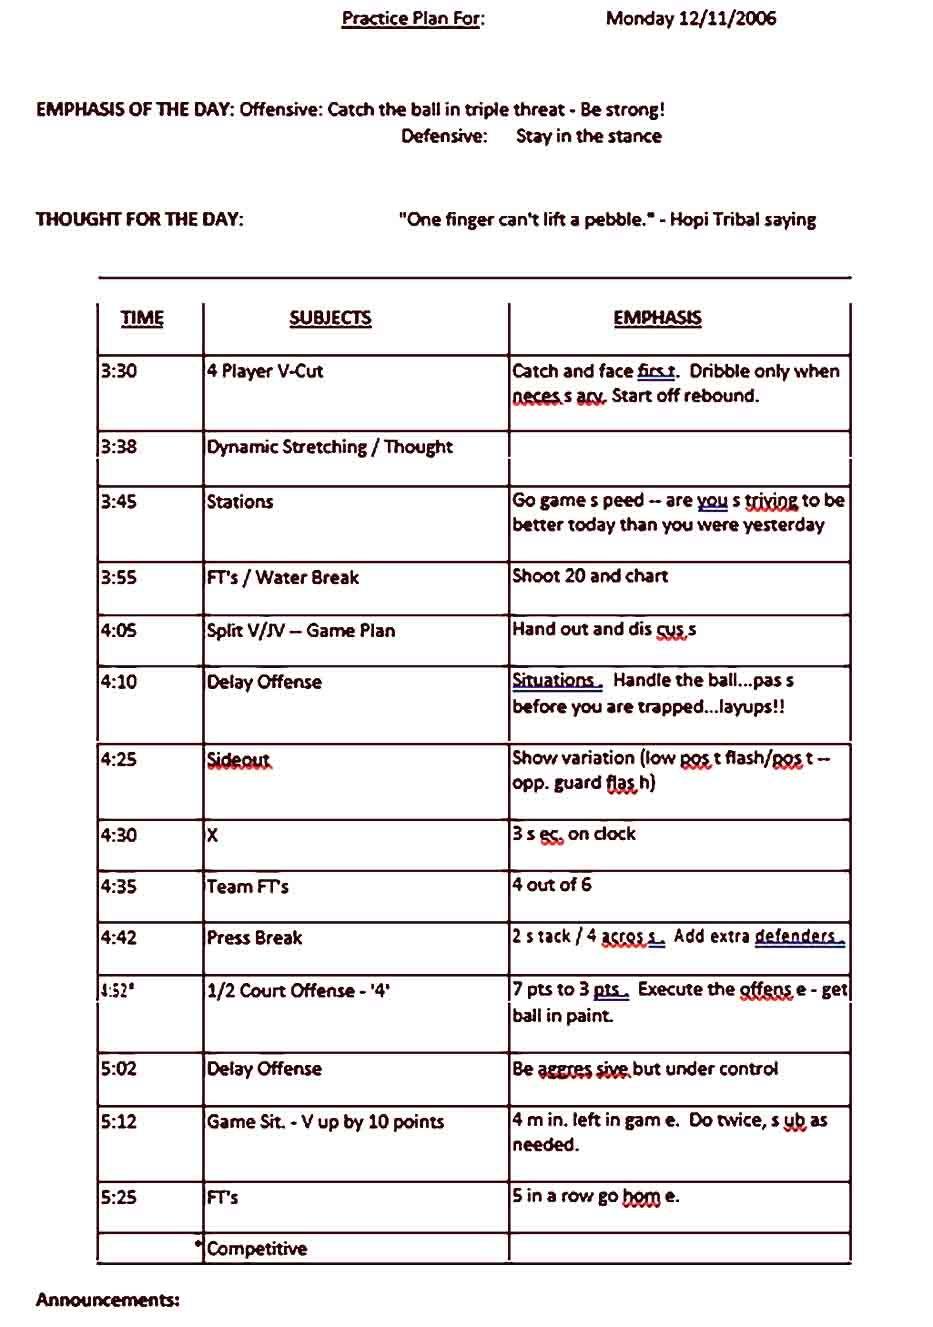 Sample Practice Schedule Template